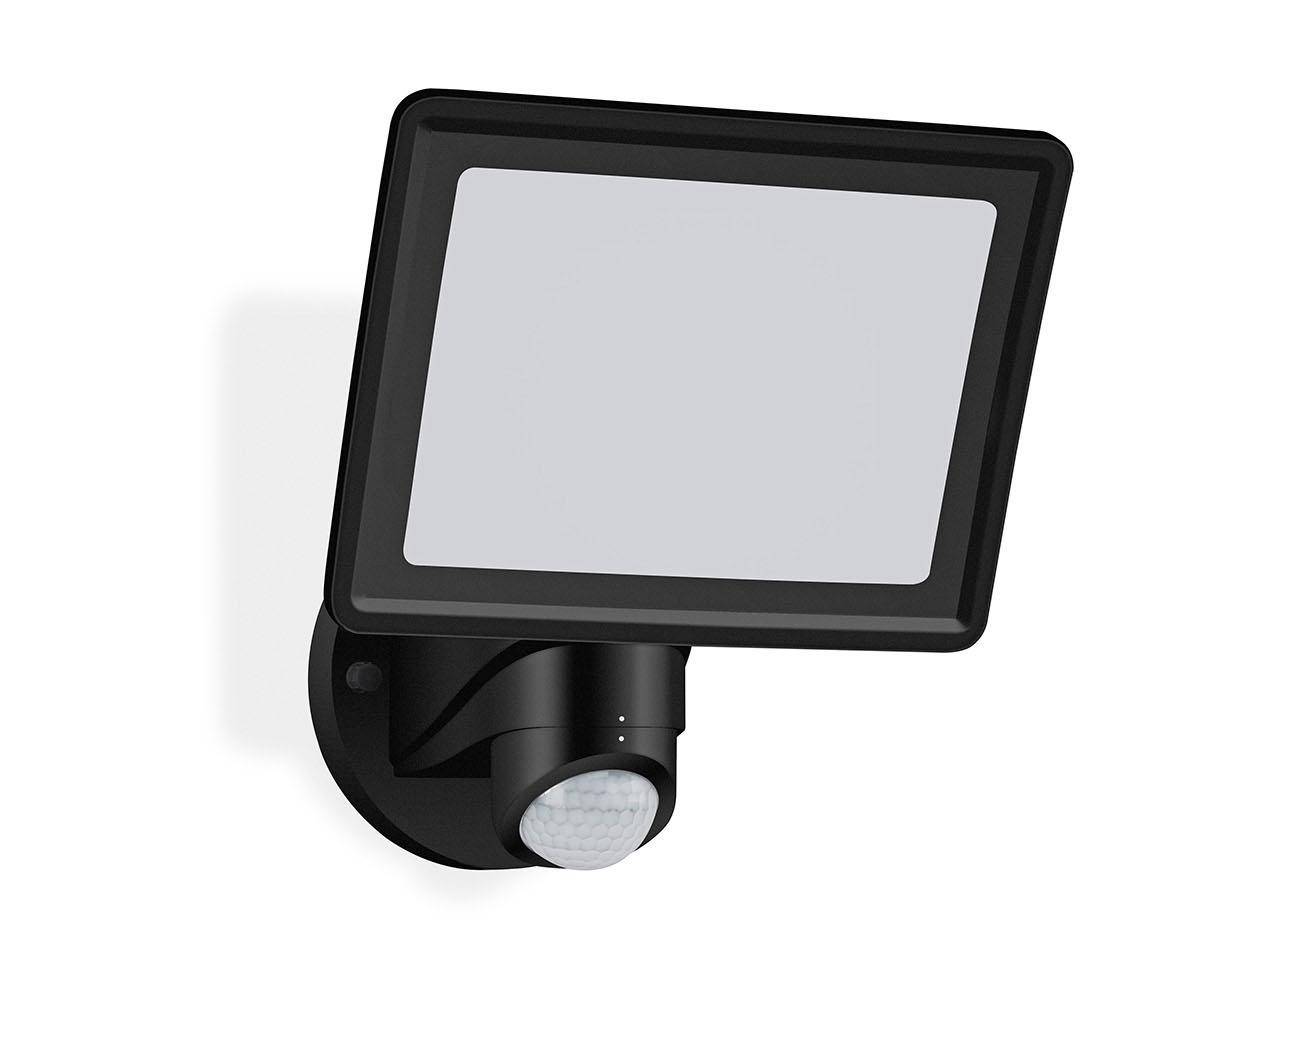 TELEFUNKEN LED Sensor Außenstrahler, 26,3 cm, 20 W, Schwarz